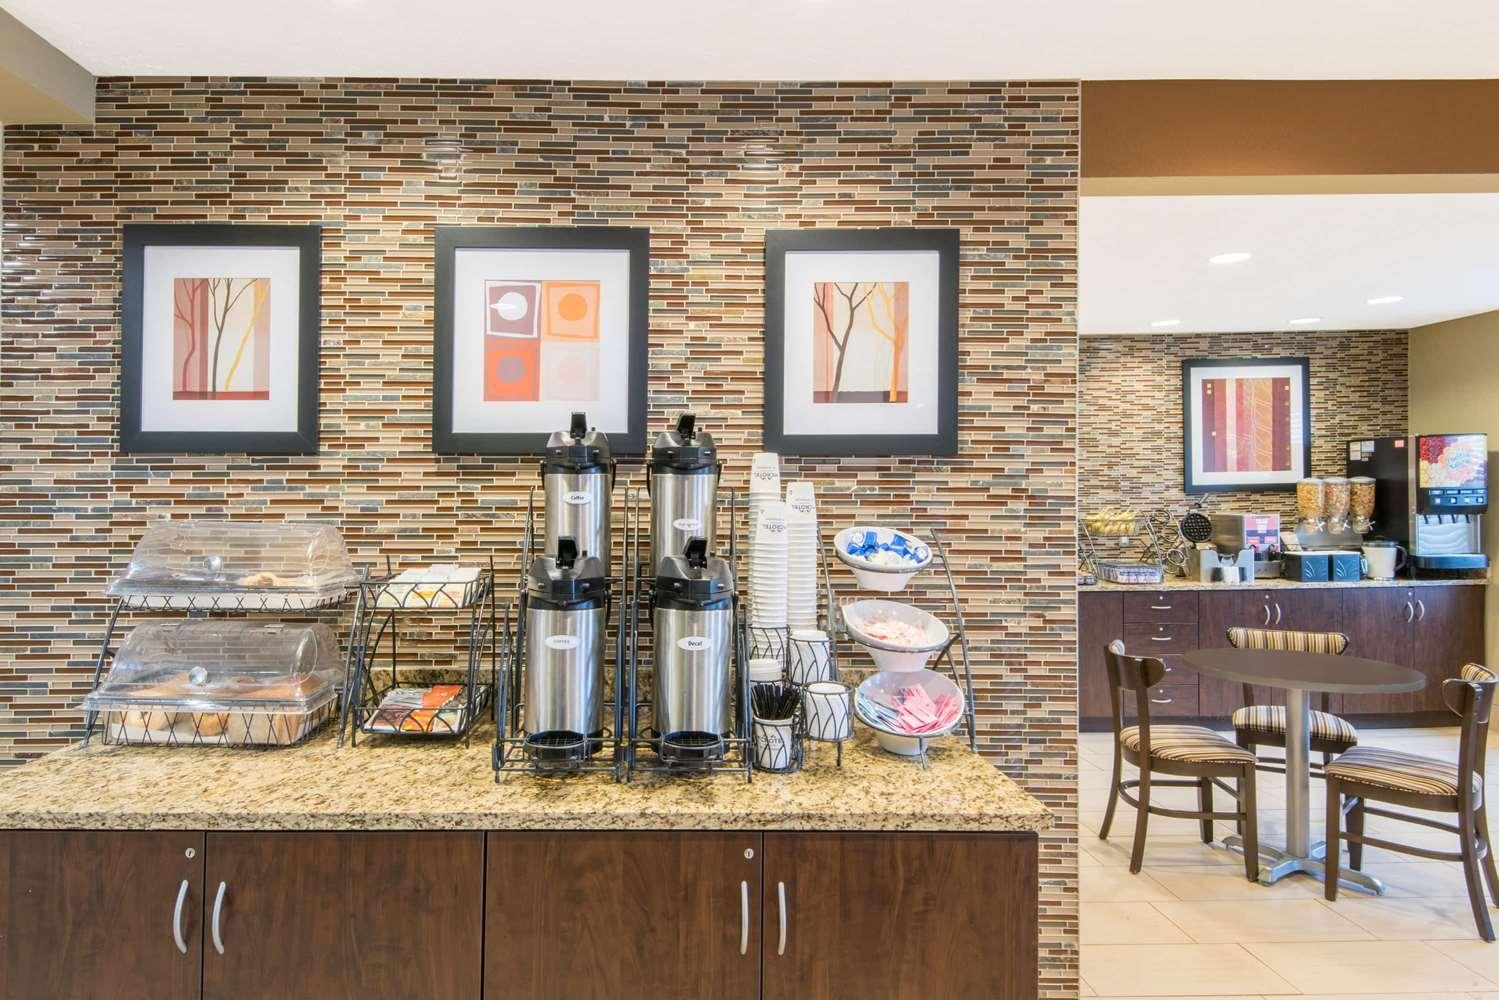 proam - Microtel Inn & Suites by Wyndham North Canton